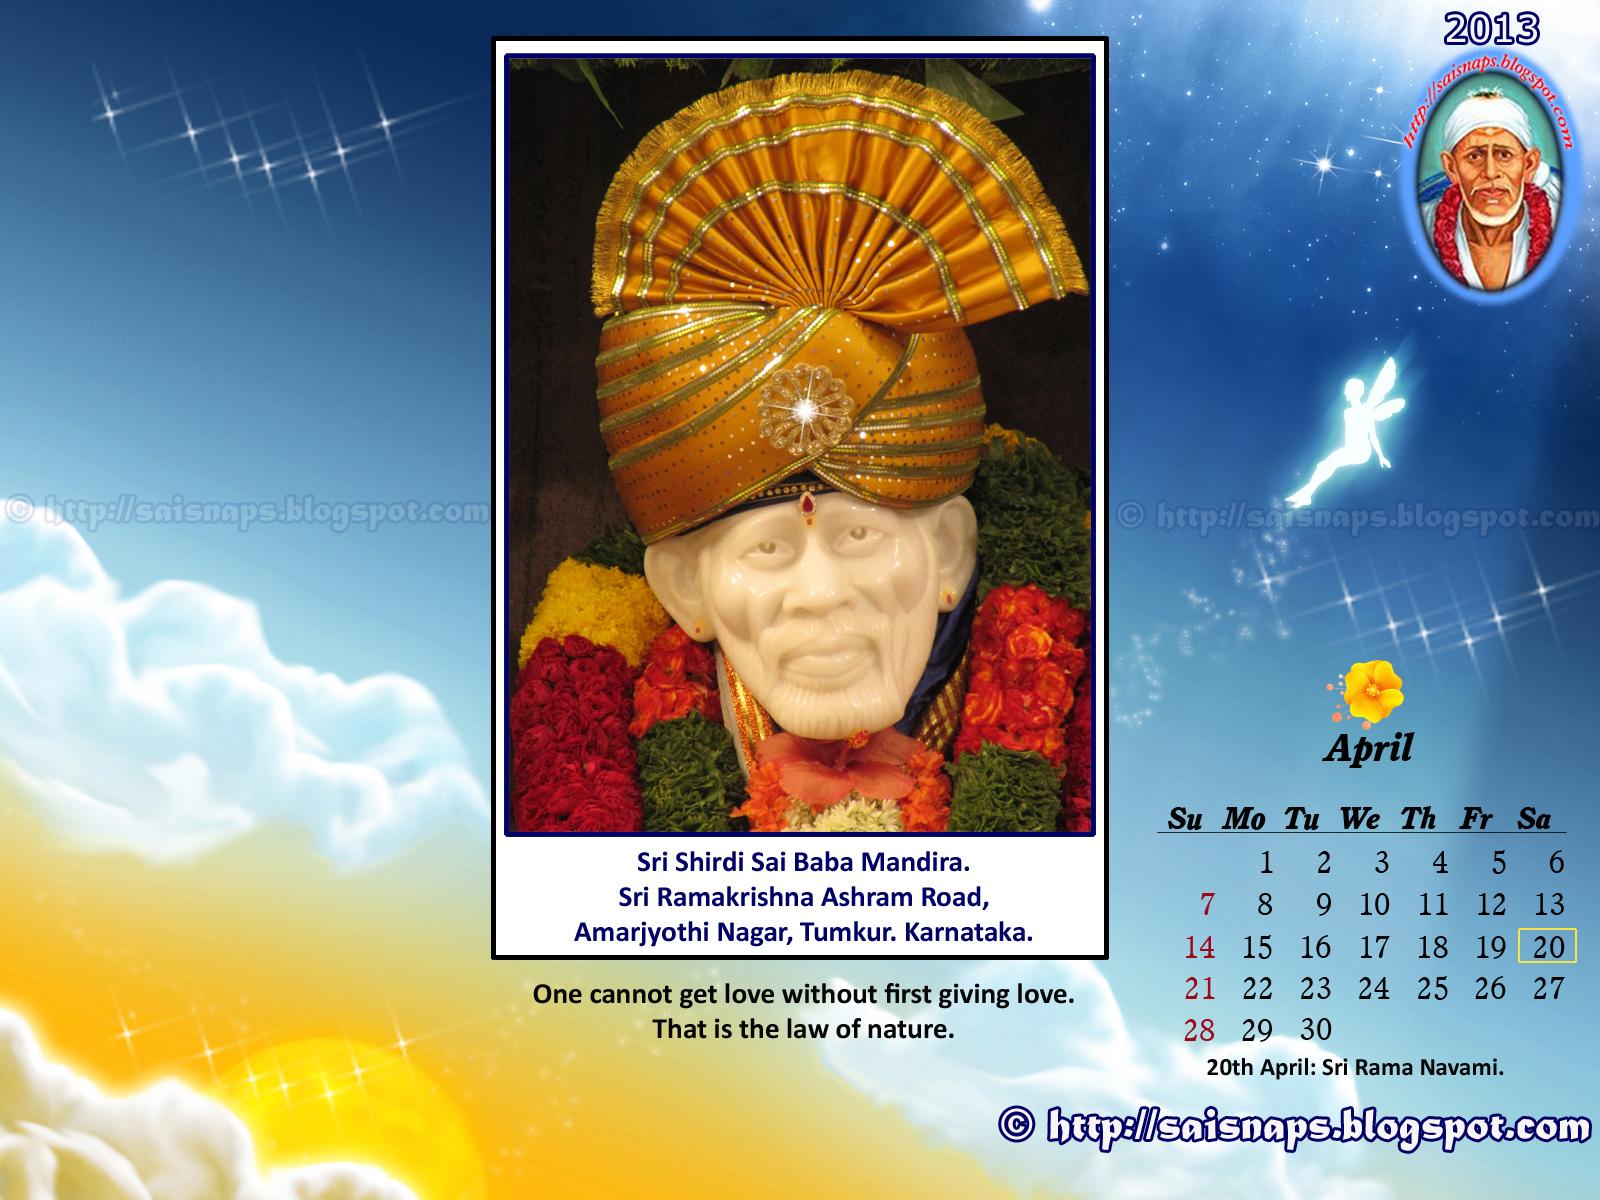 Sai In My Breath: New Year 2013 Sri Shirdi Sai Baba Wallpapers.